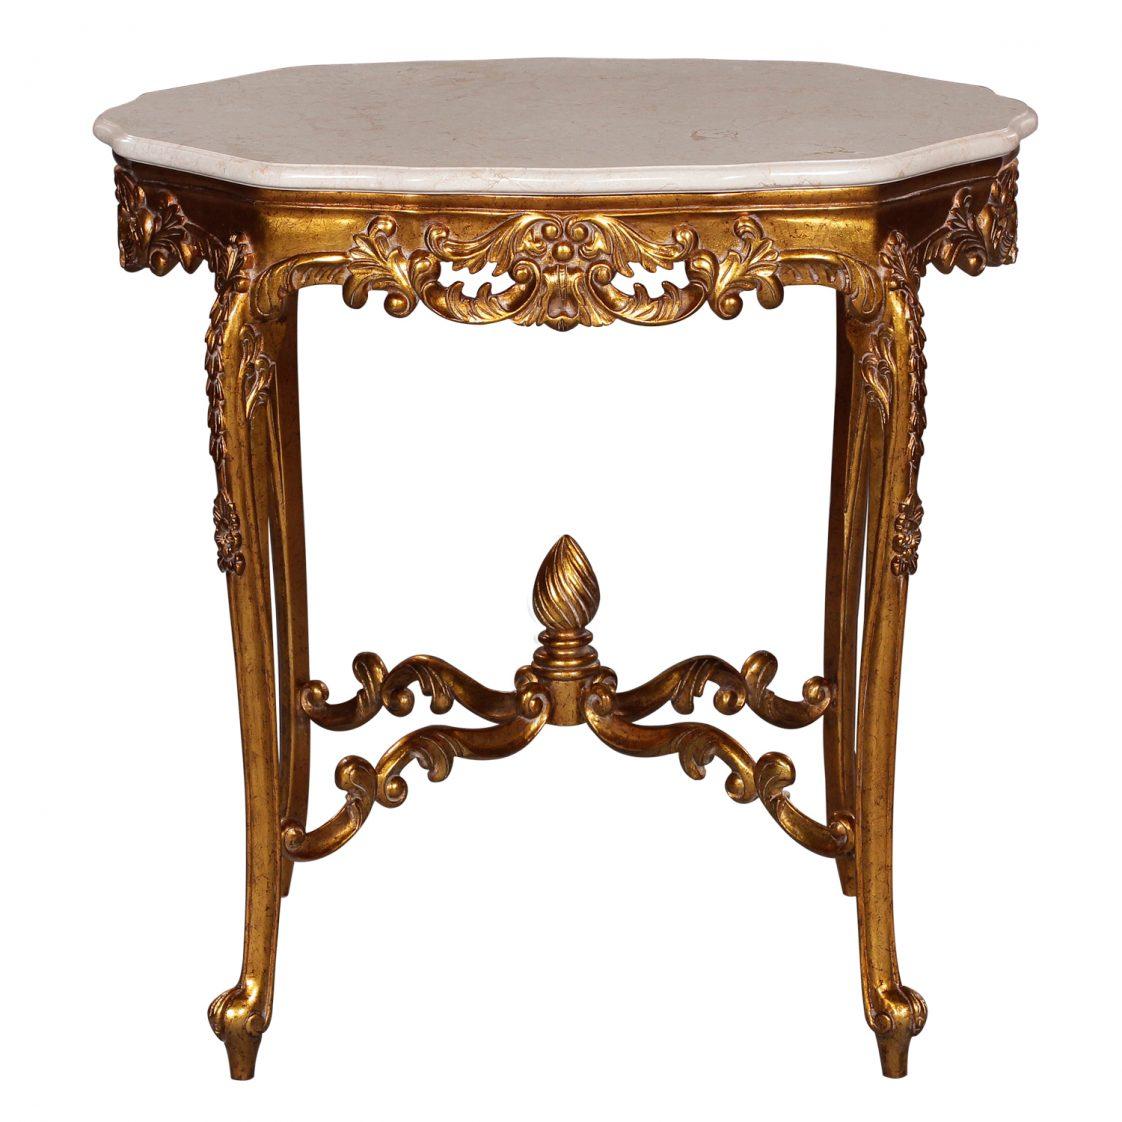 louis xv center table jansen furniture. Black Bedroom Furniture Sets. Home Design Ideas